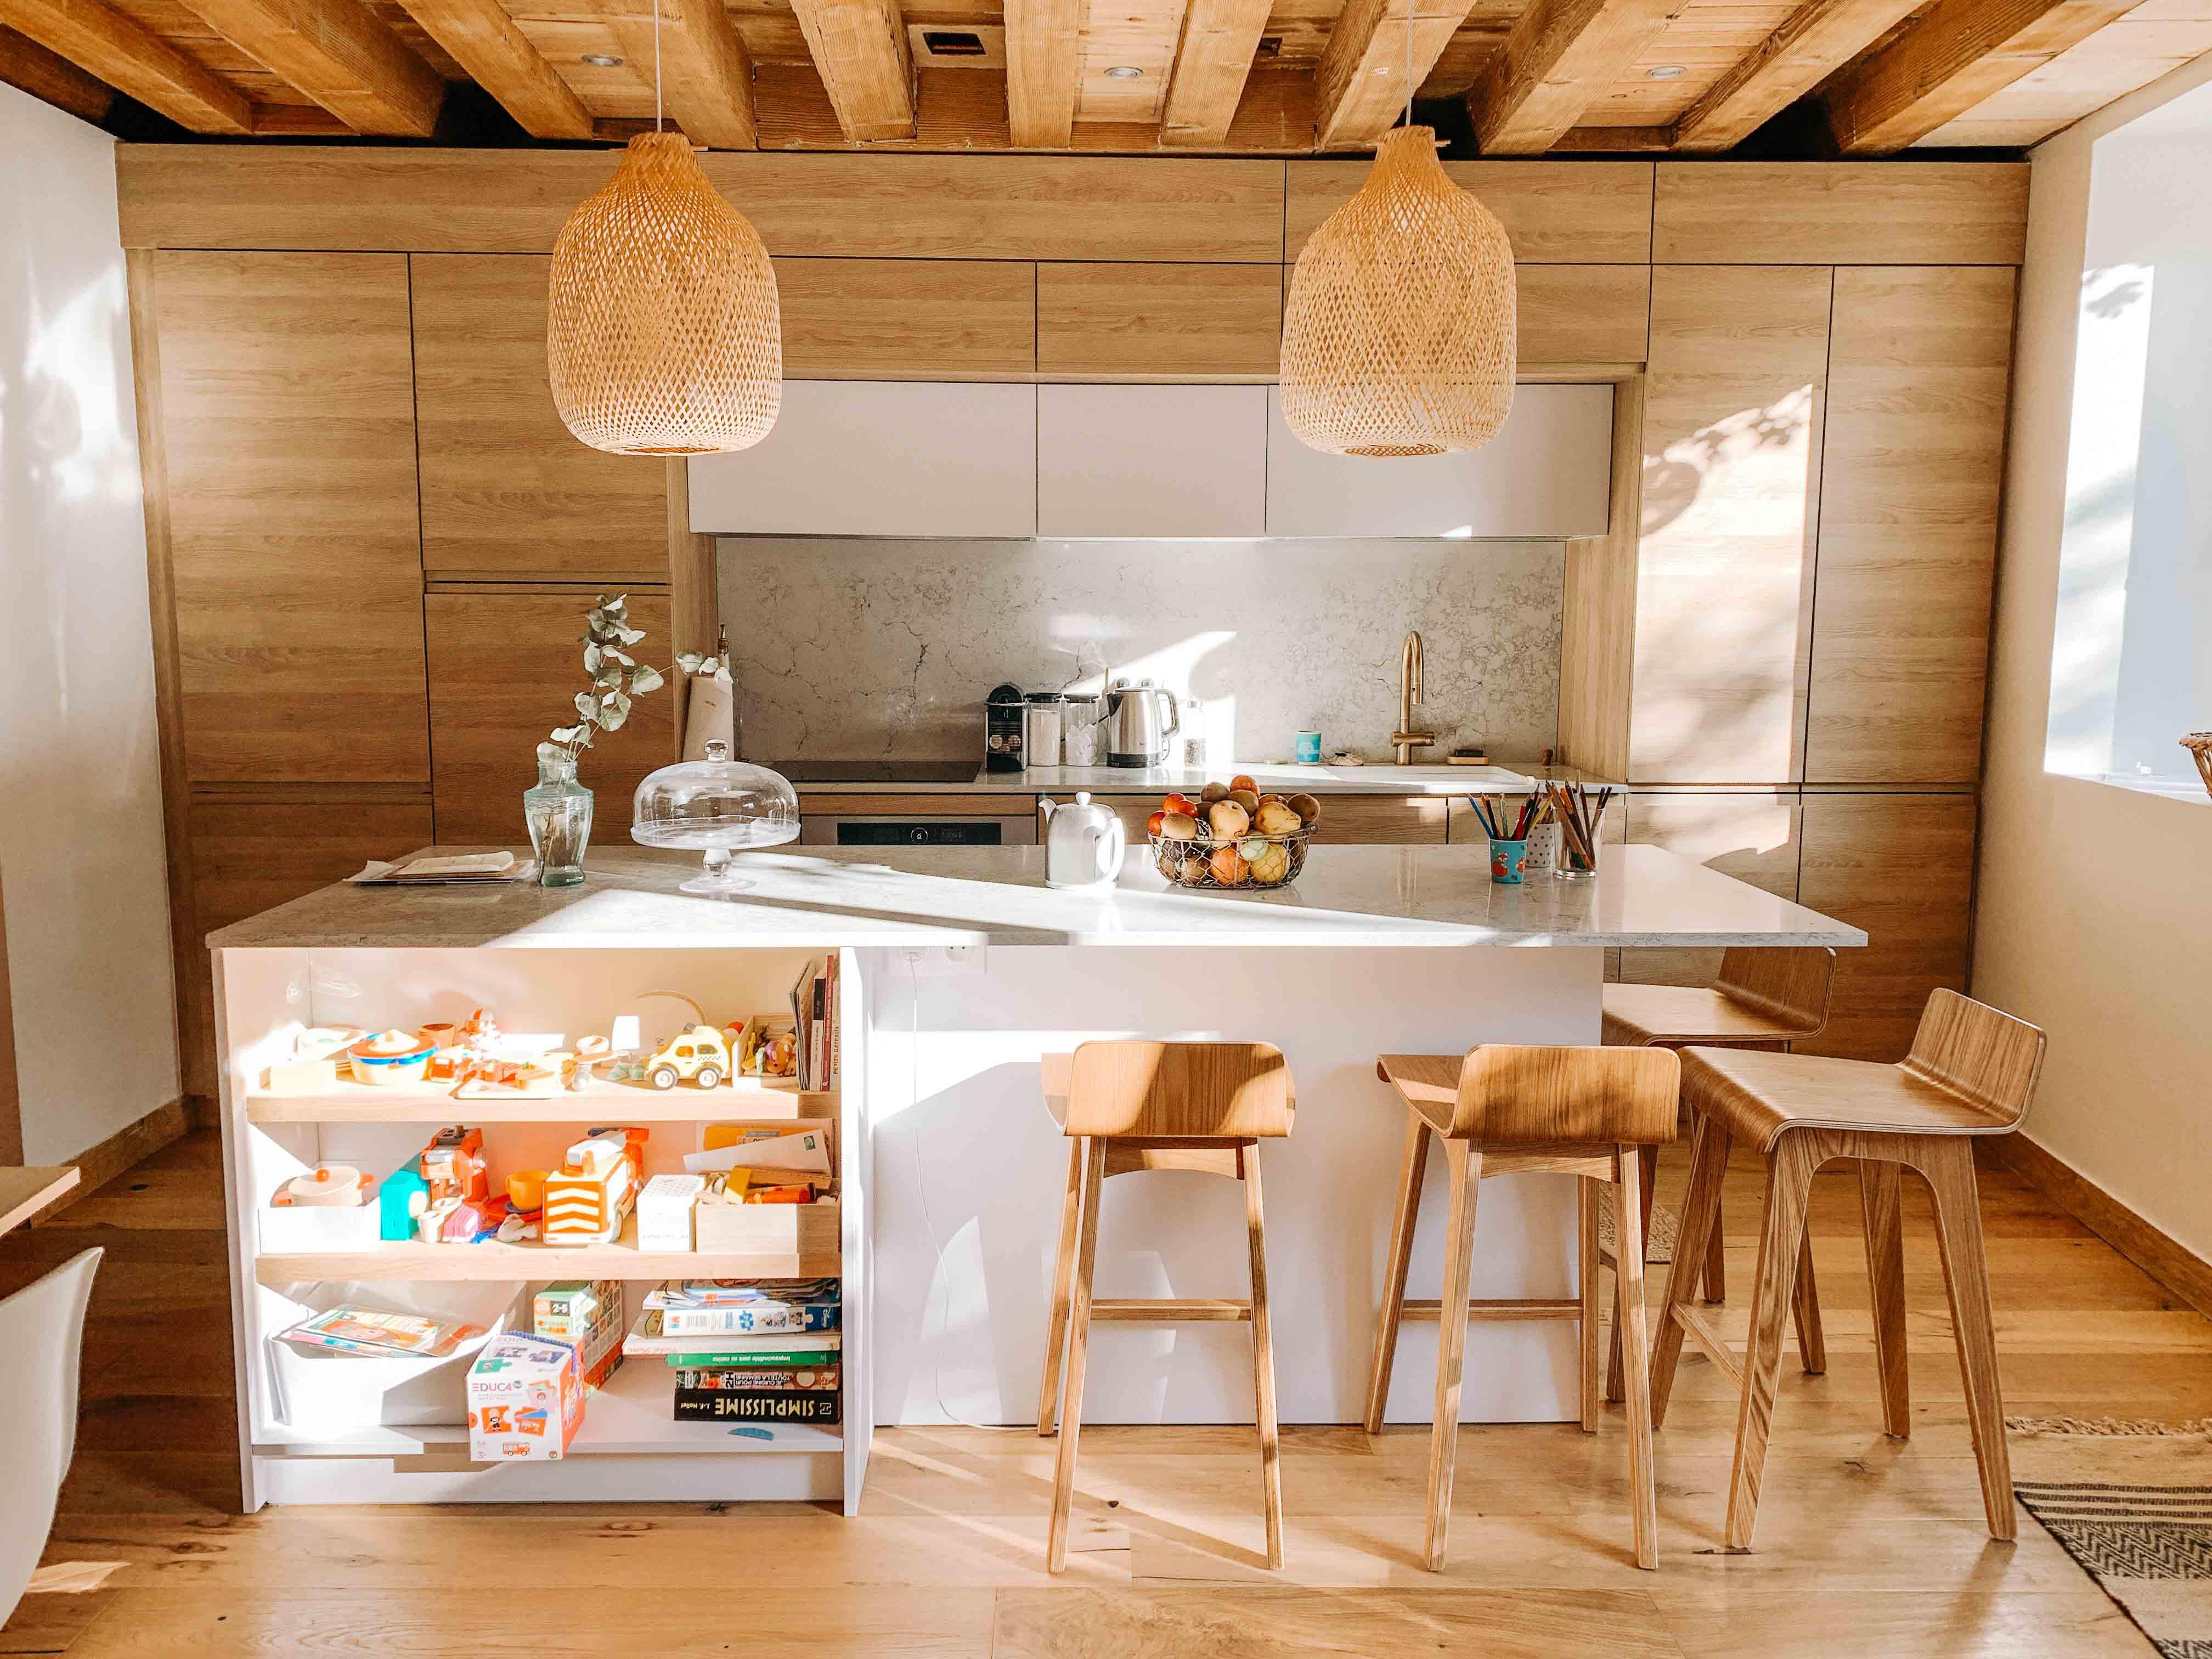 architecte-lyon-rénovation-presbytere-marcilly-azergues-pierre-dorée-23